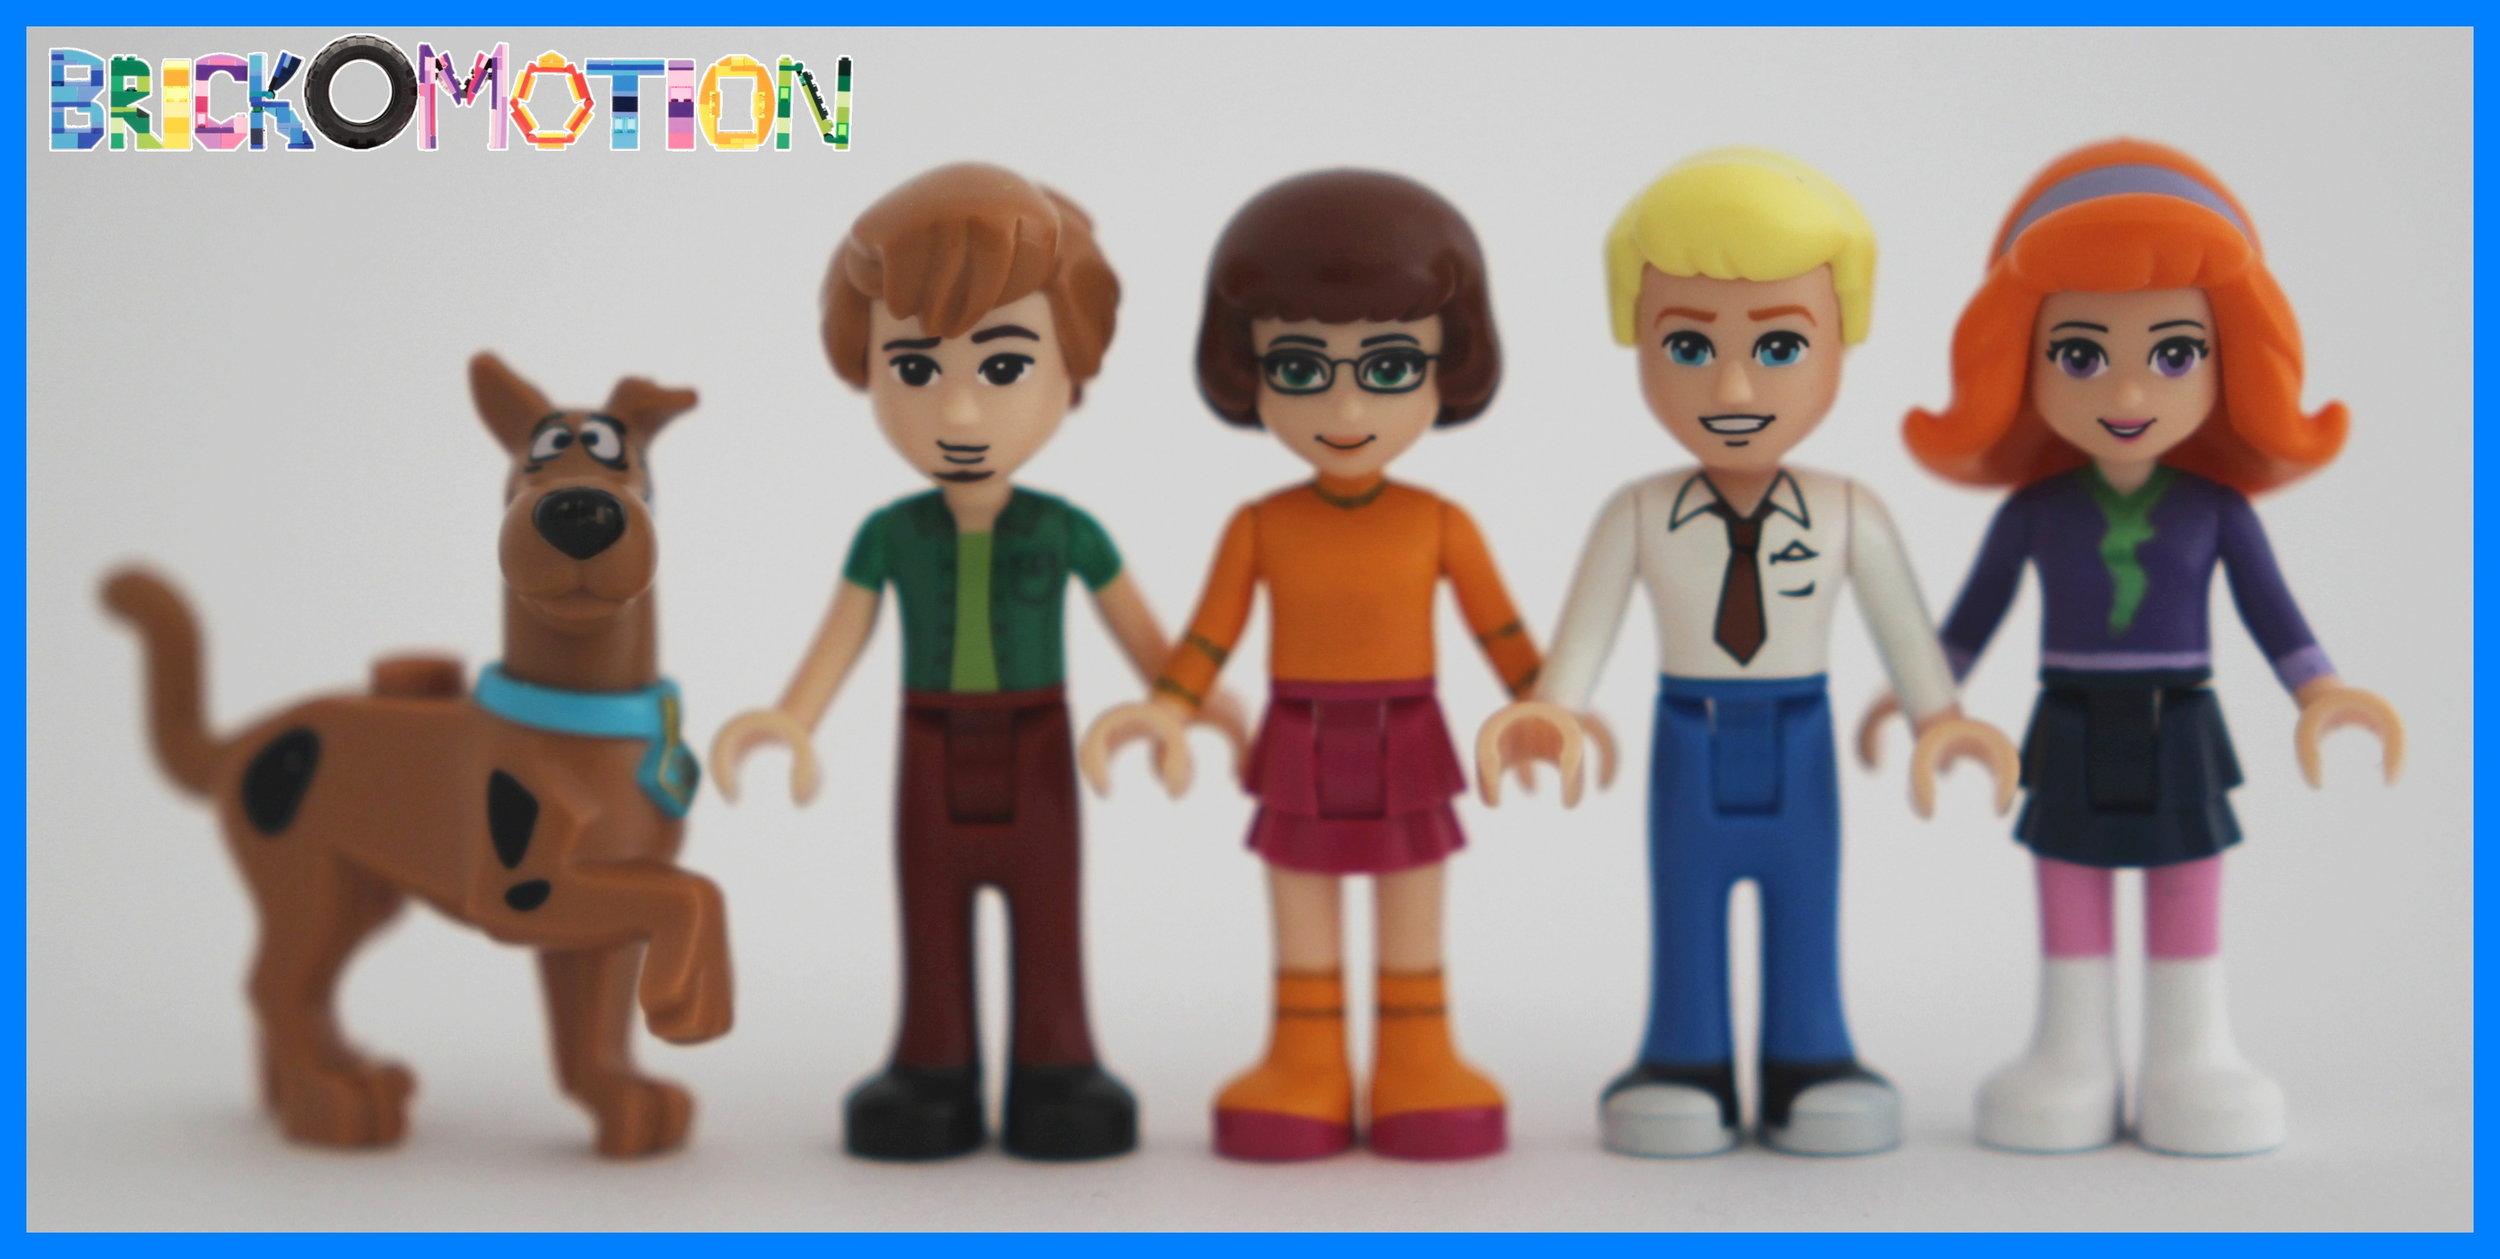 Mystery Inc.: Scooby Doo, Shaggy, Velma, Fred and Daphne